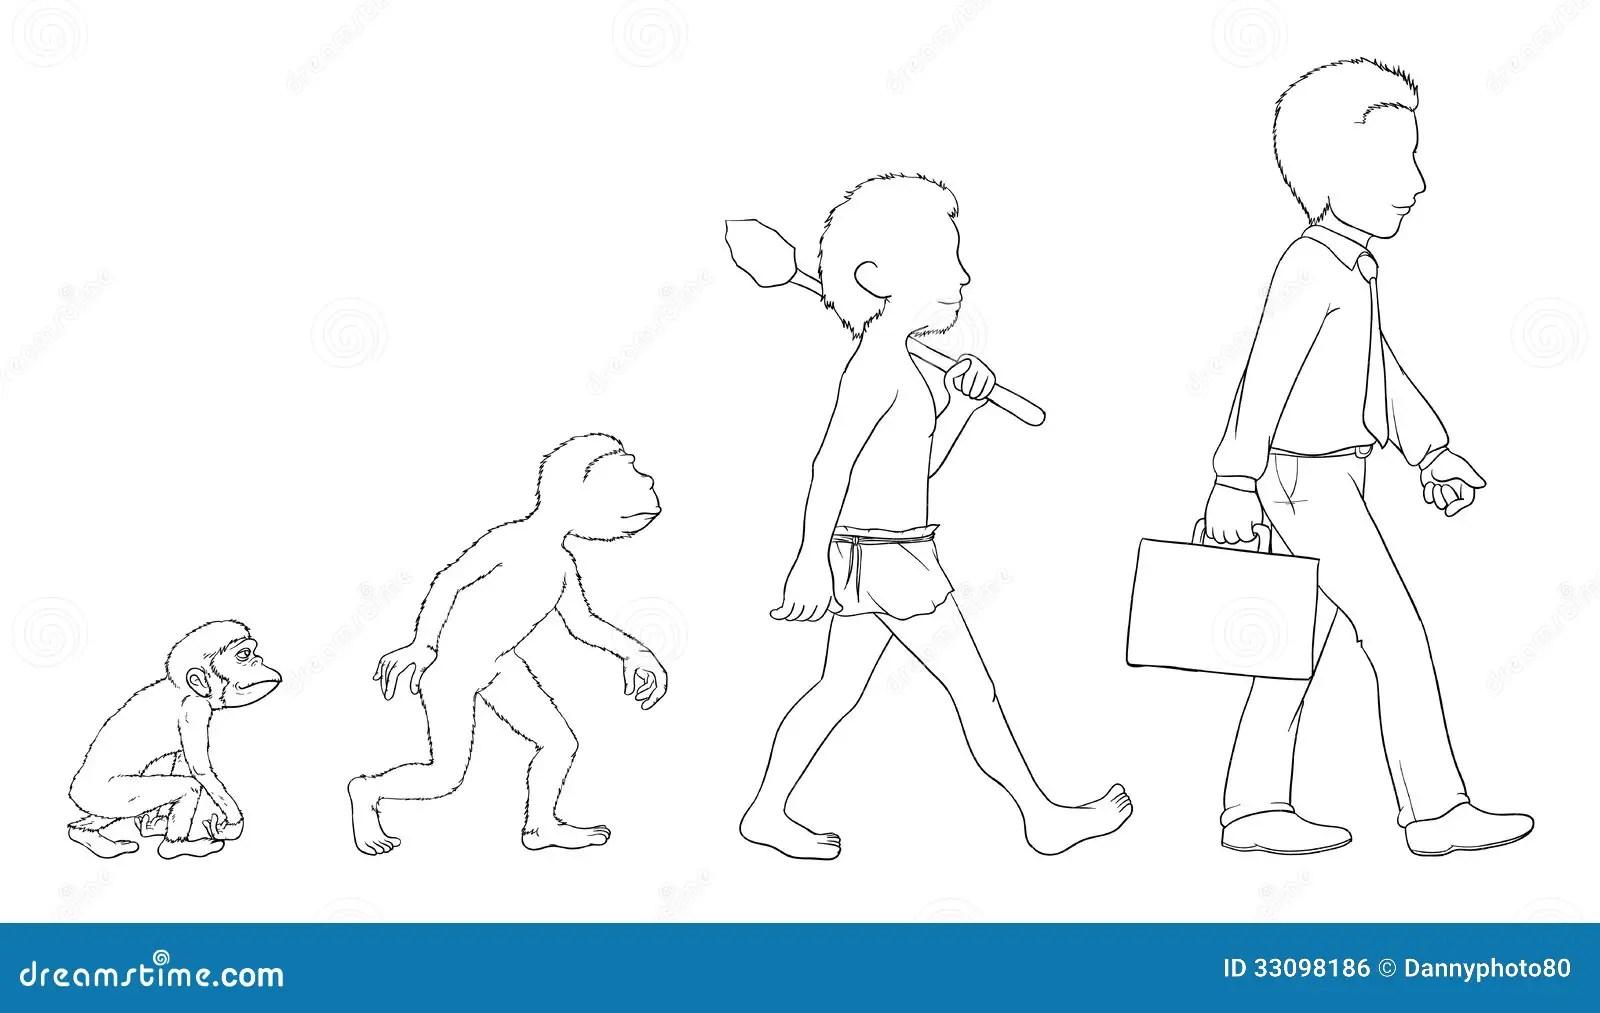 Evolution outline stock vector. Illustration of growth